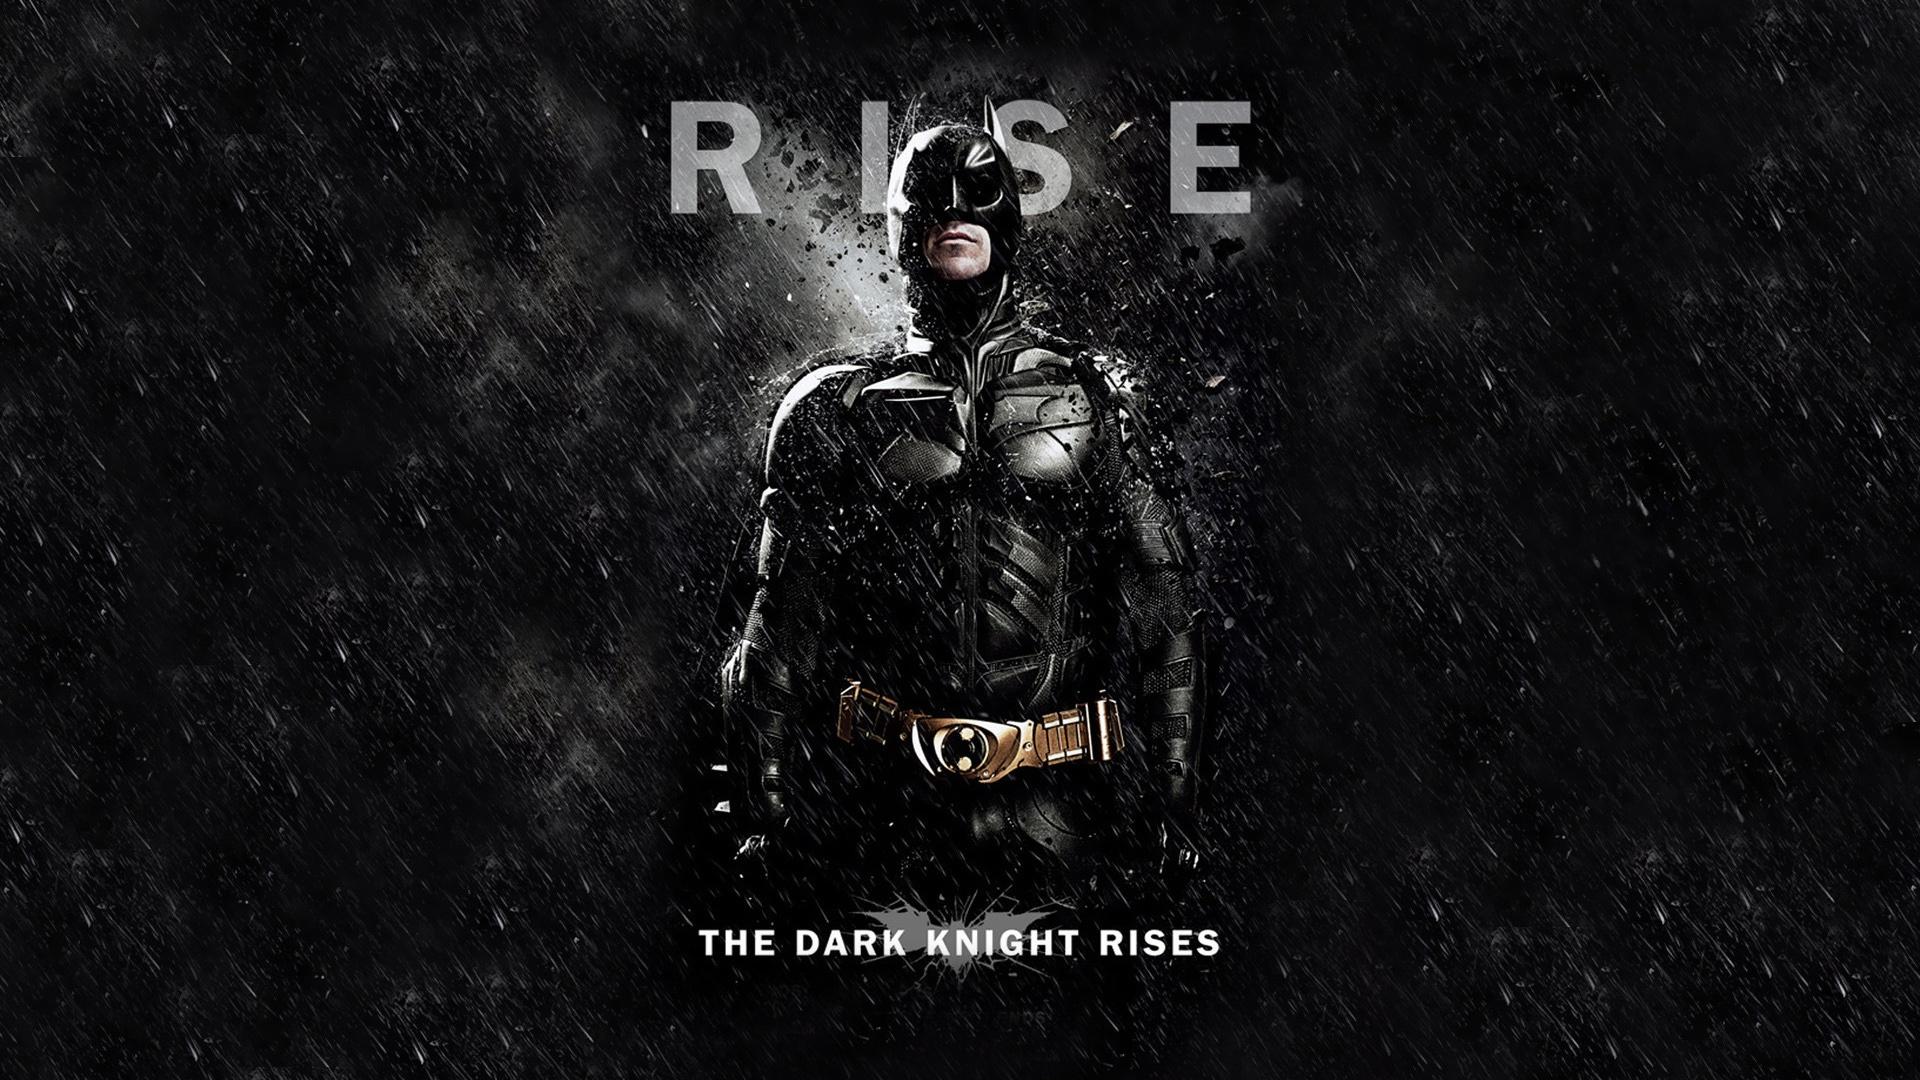 Batman The Dark Knight Rises Wallpapers HD Wallpapers 1920x1080